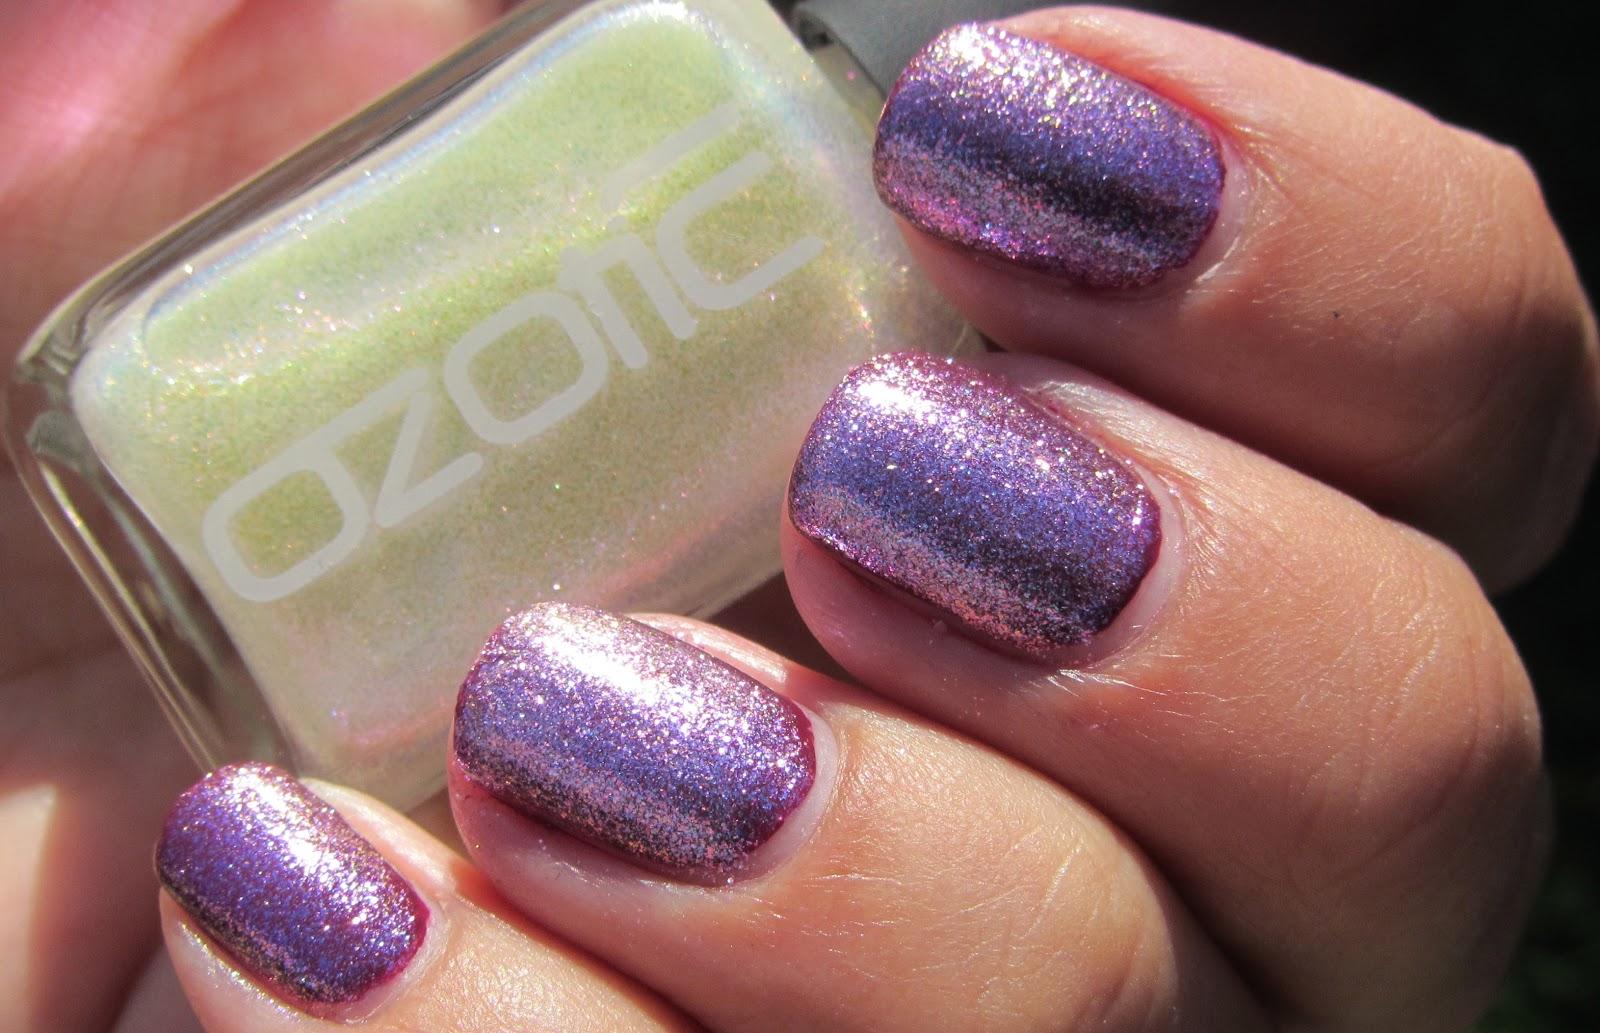 My Nail Polish Obsession: Ozotic Beam 906